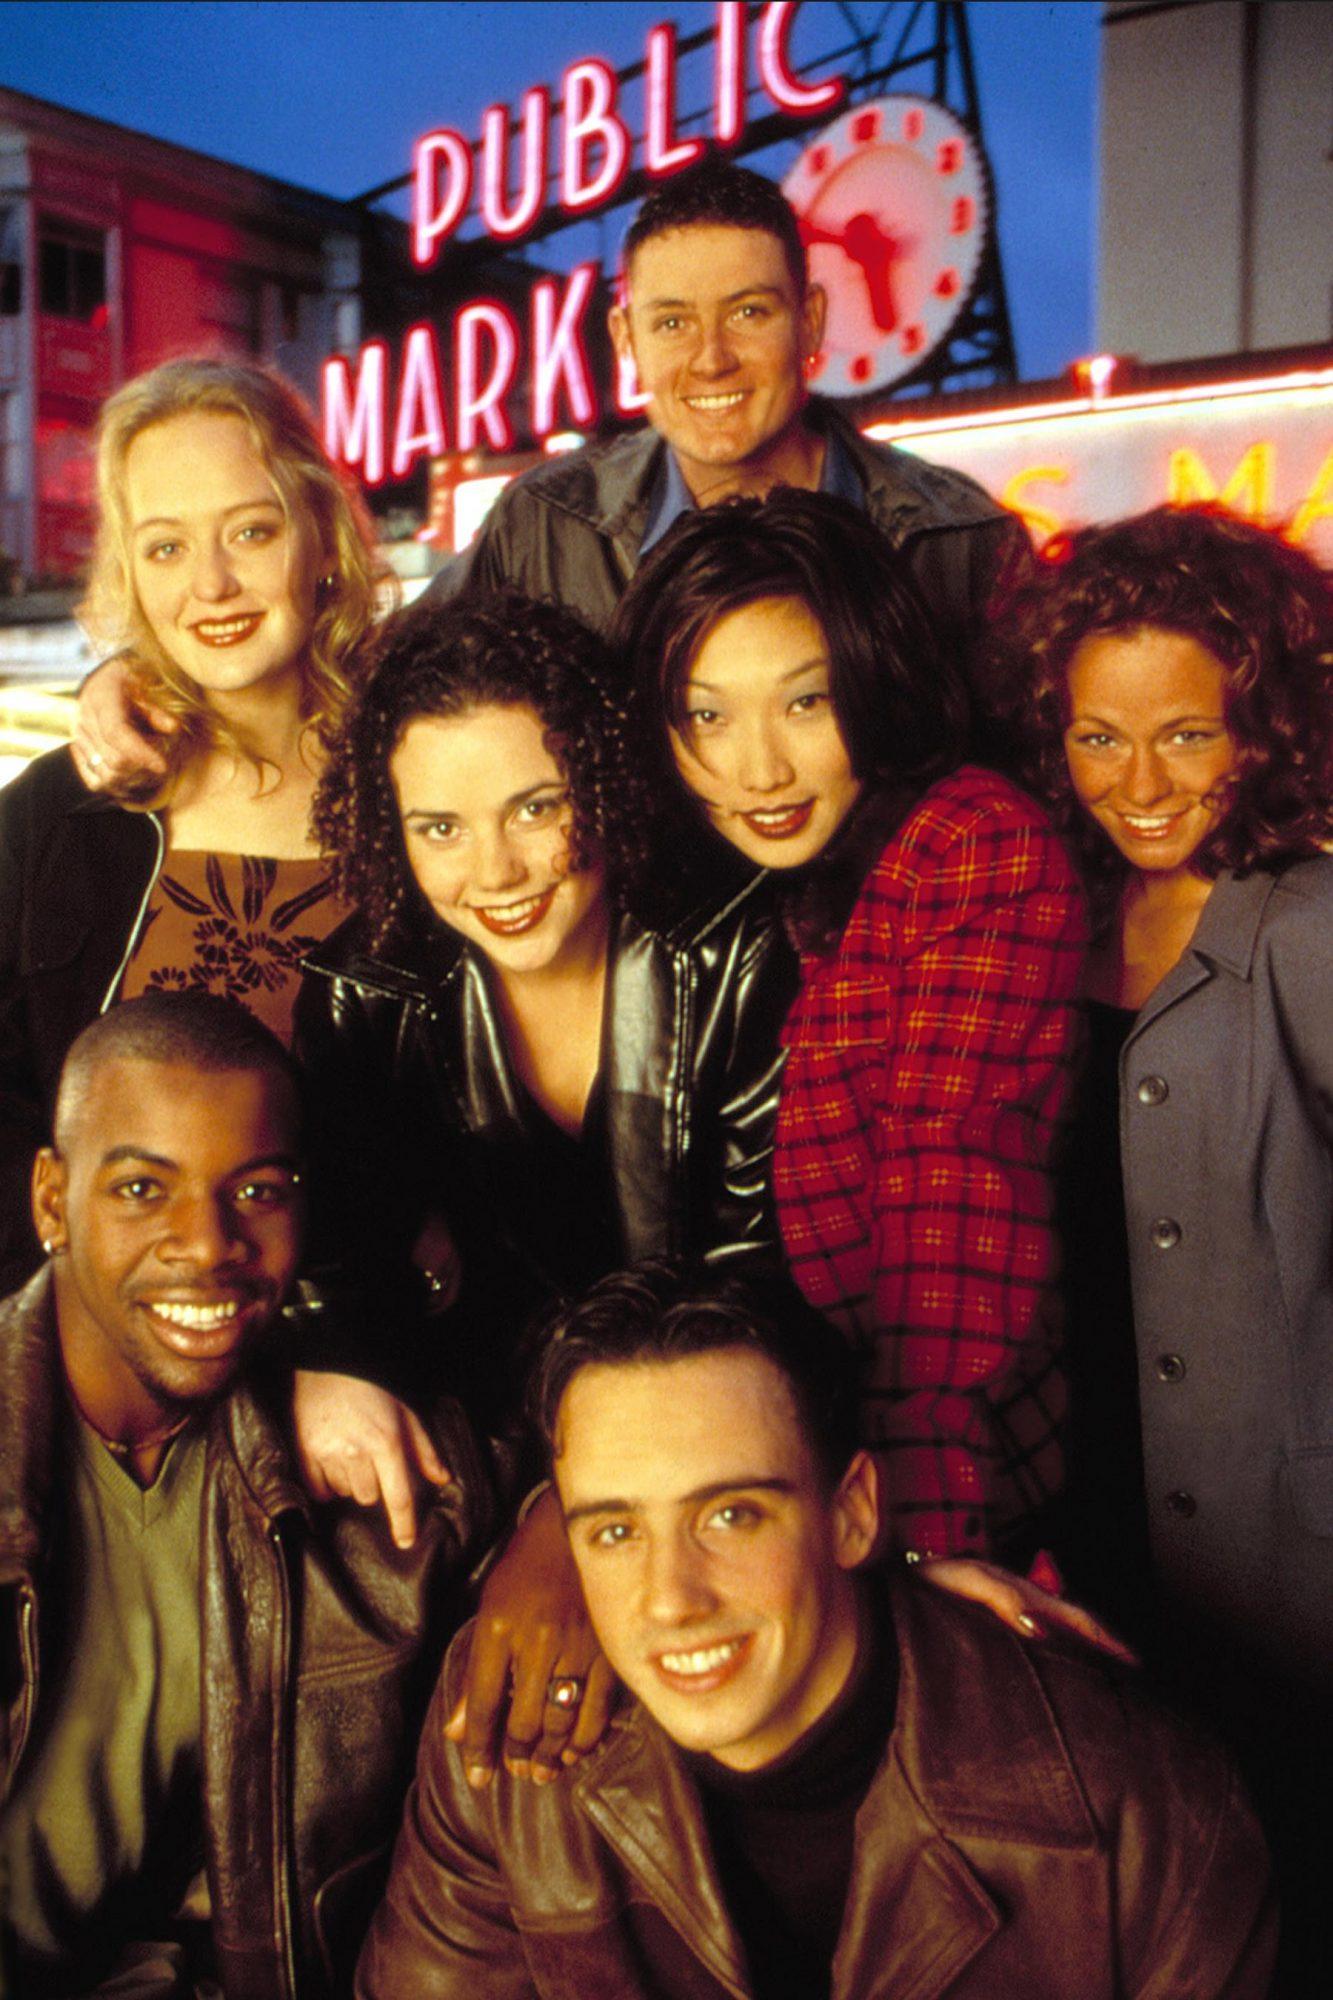 REAL WORLD, SEATTLE, Rebecca, Nate, Irene, Janet, Lindsay, Stephen, Dave, (1998), 7th season, 1992-p